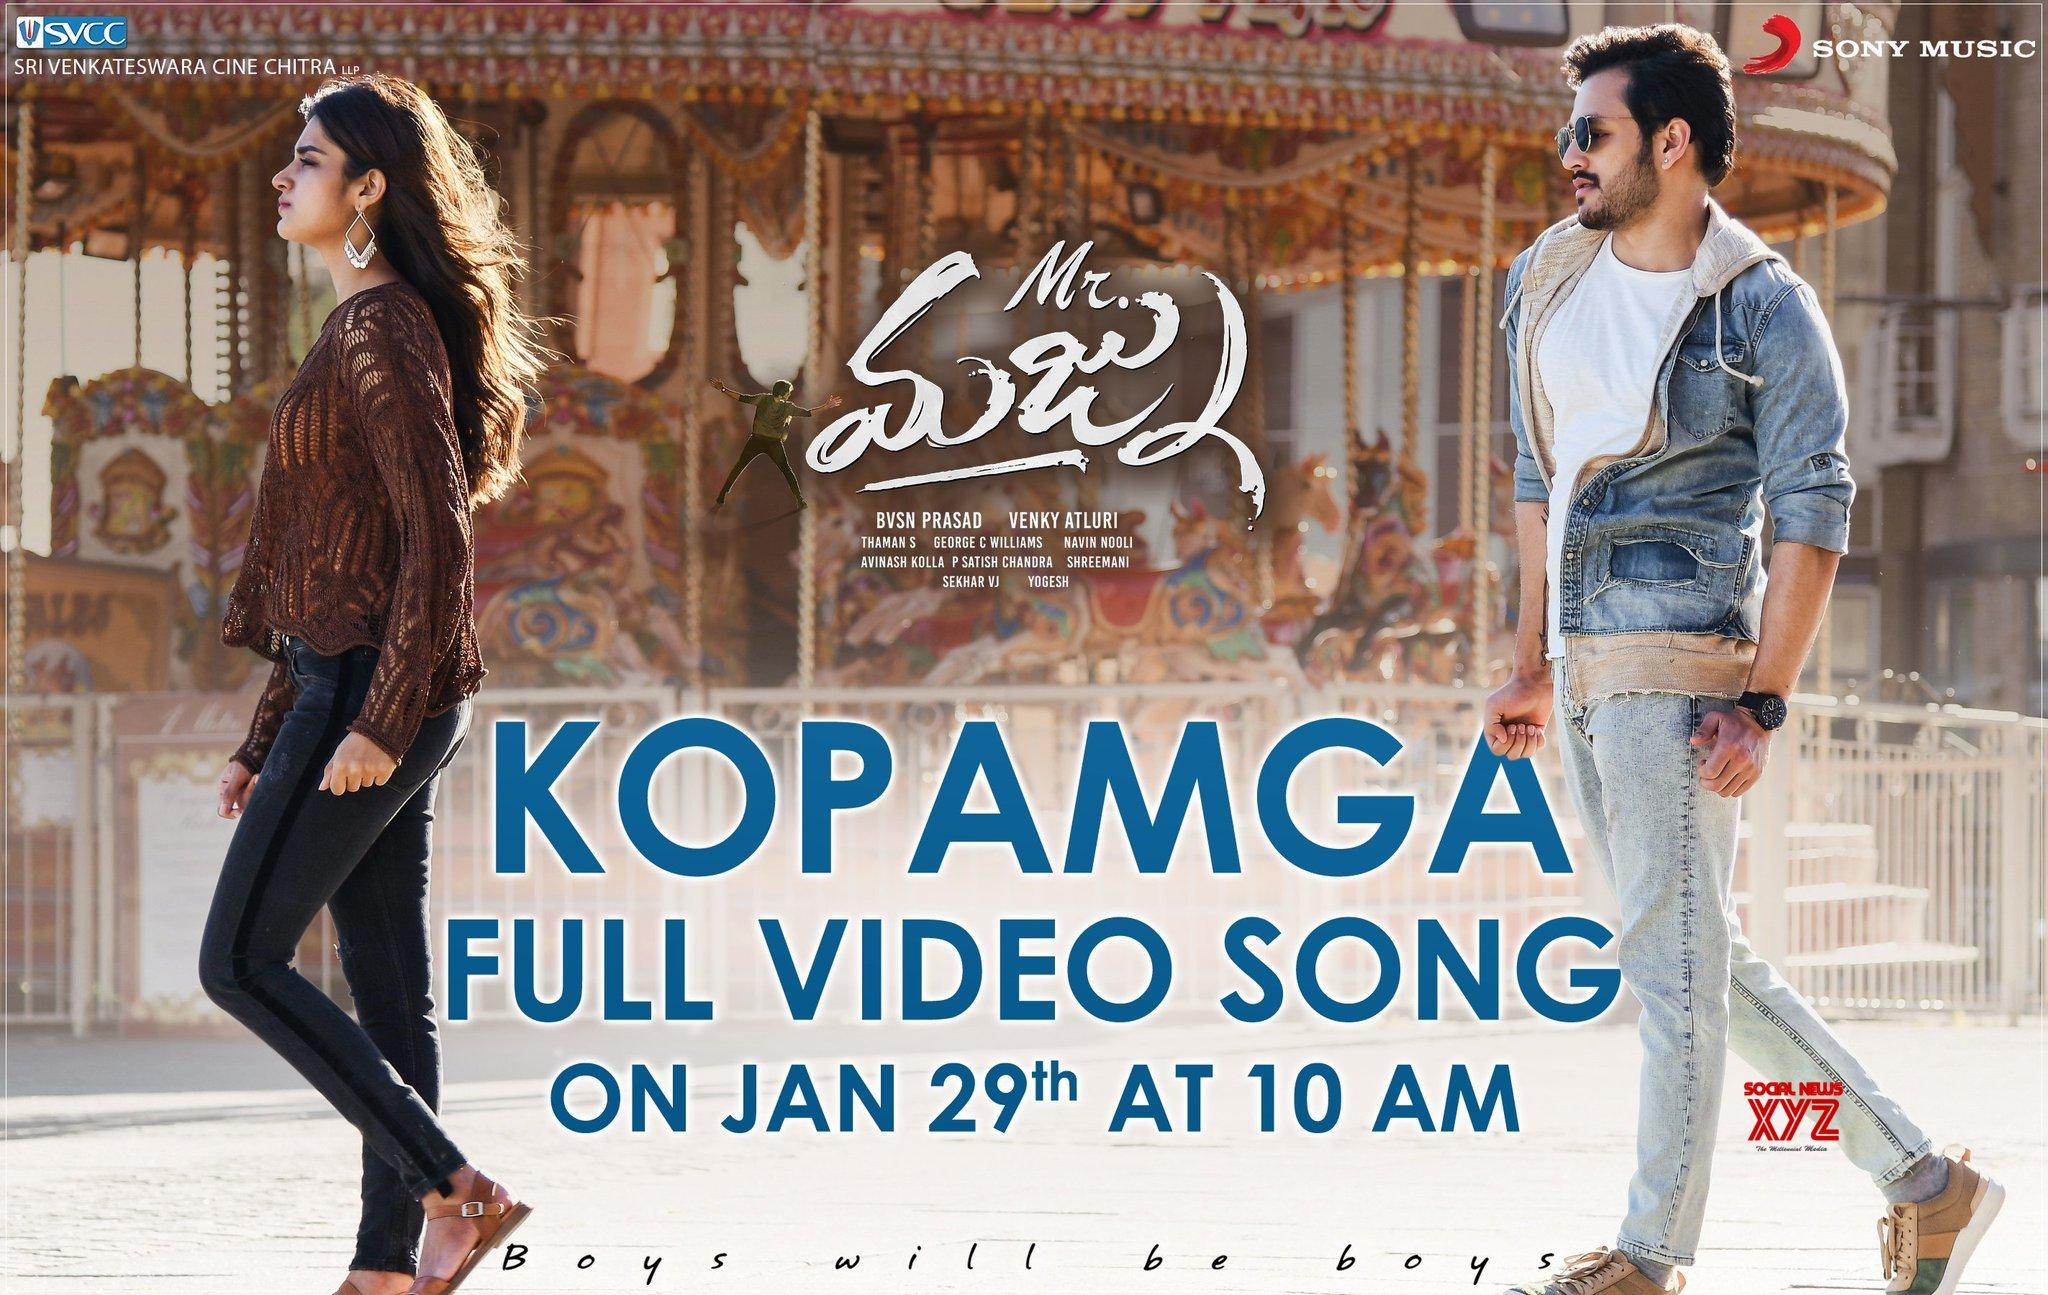 Kopamga Full Video Song From Mr.Majnu Will Be Out At 10 AM Tomorrow